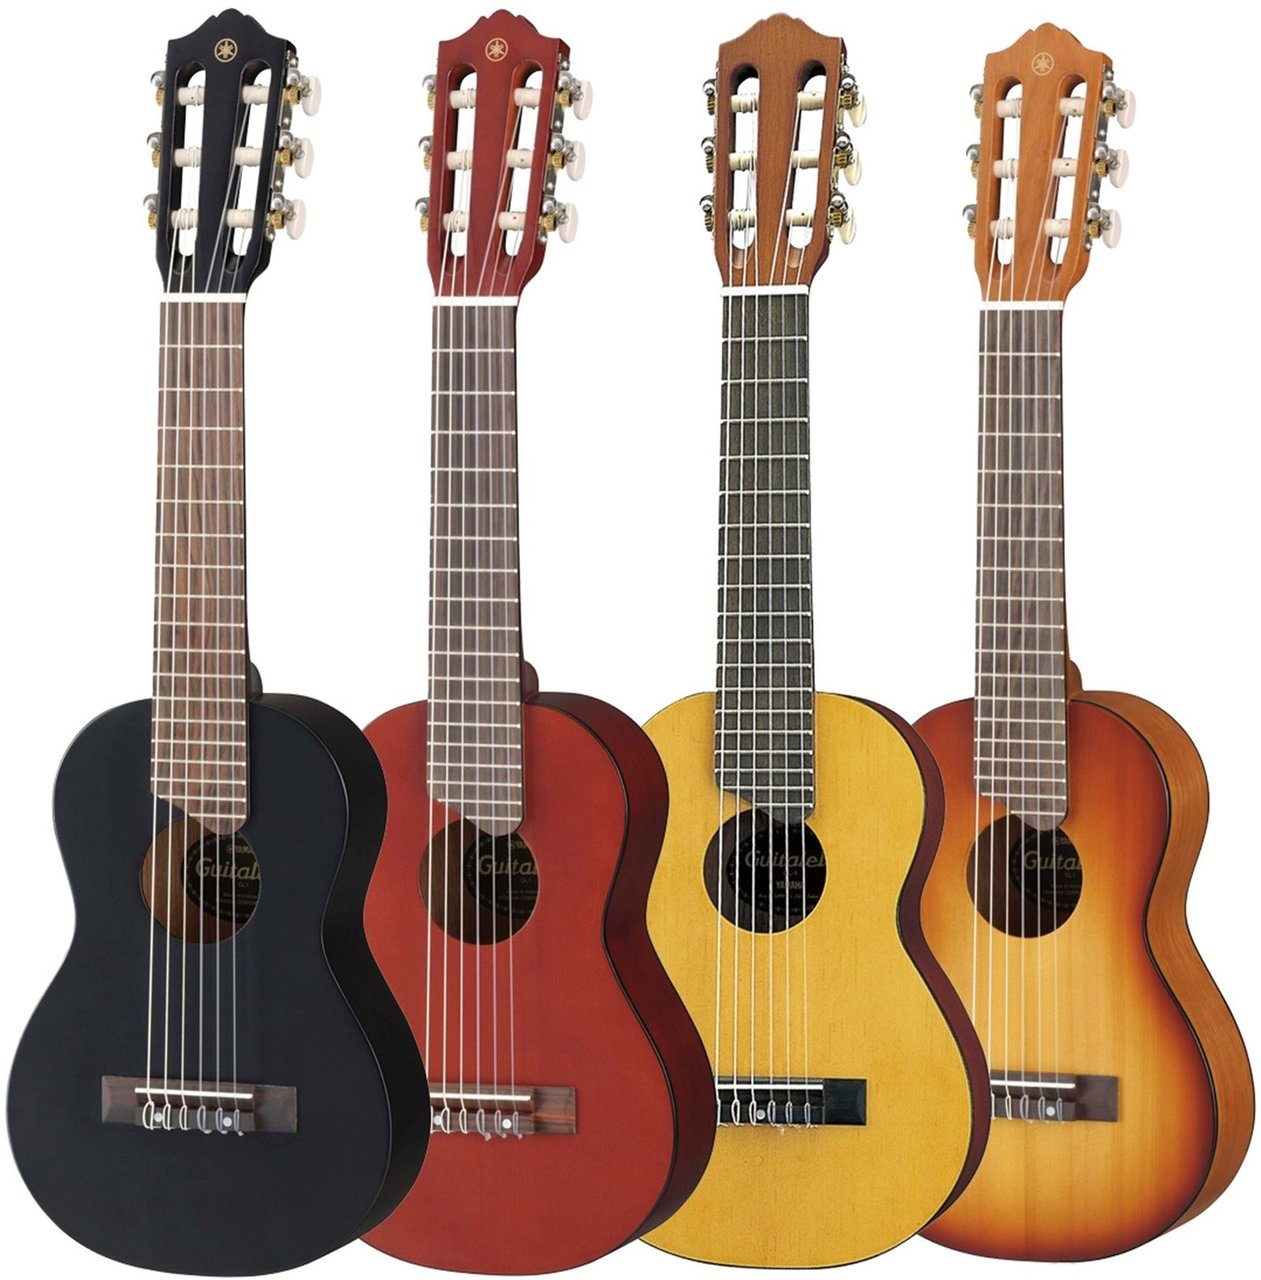 Ukulele, guitalele, banjo, mandolína